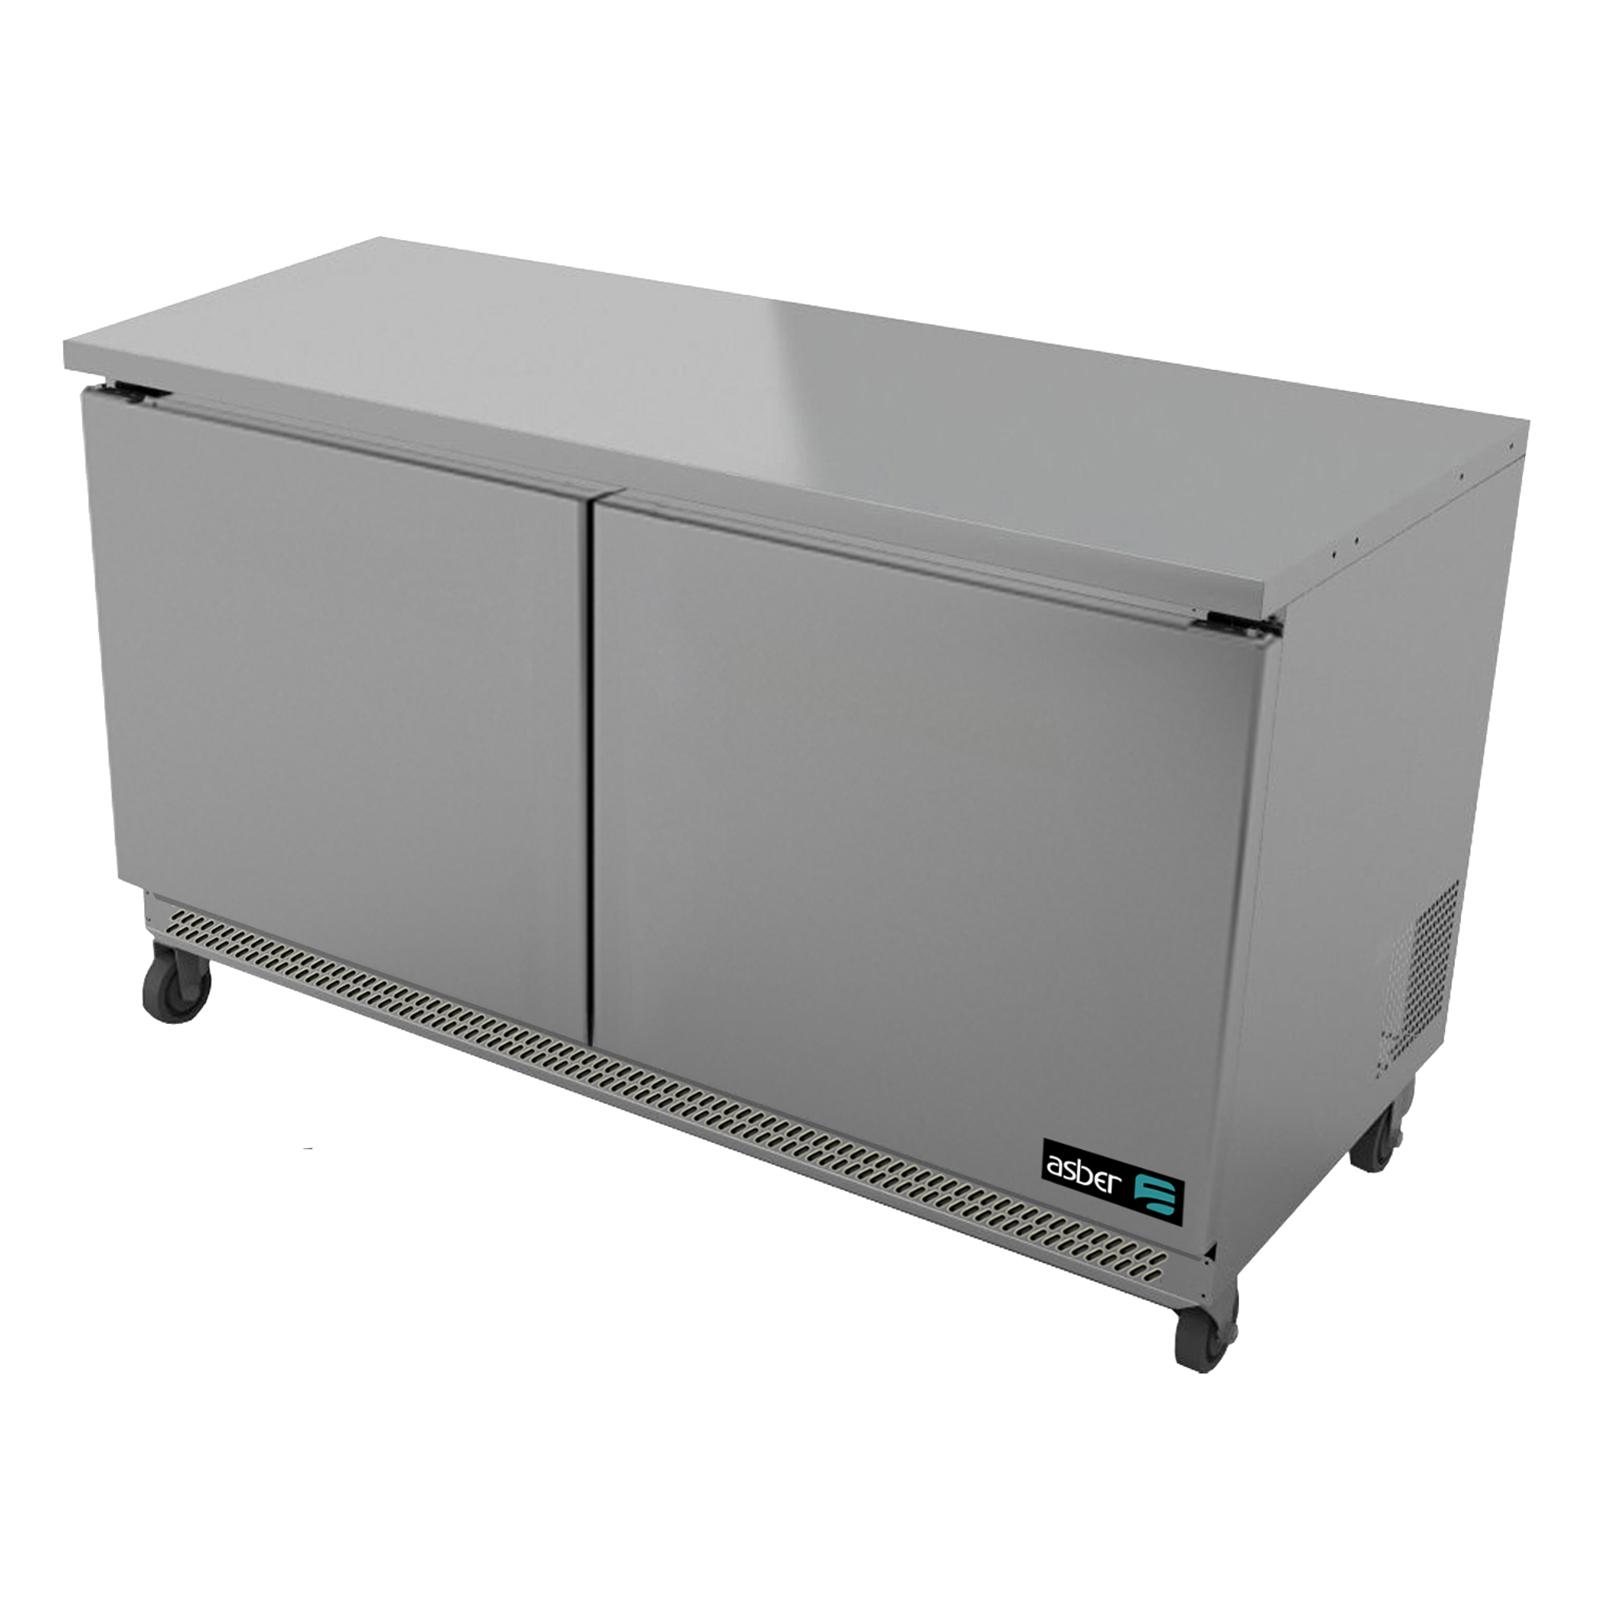 Asber AUTR-60 refrigerator, undercounter, reach-in